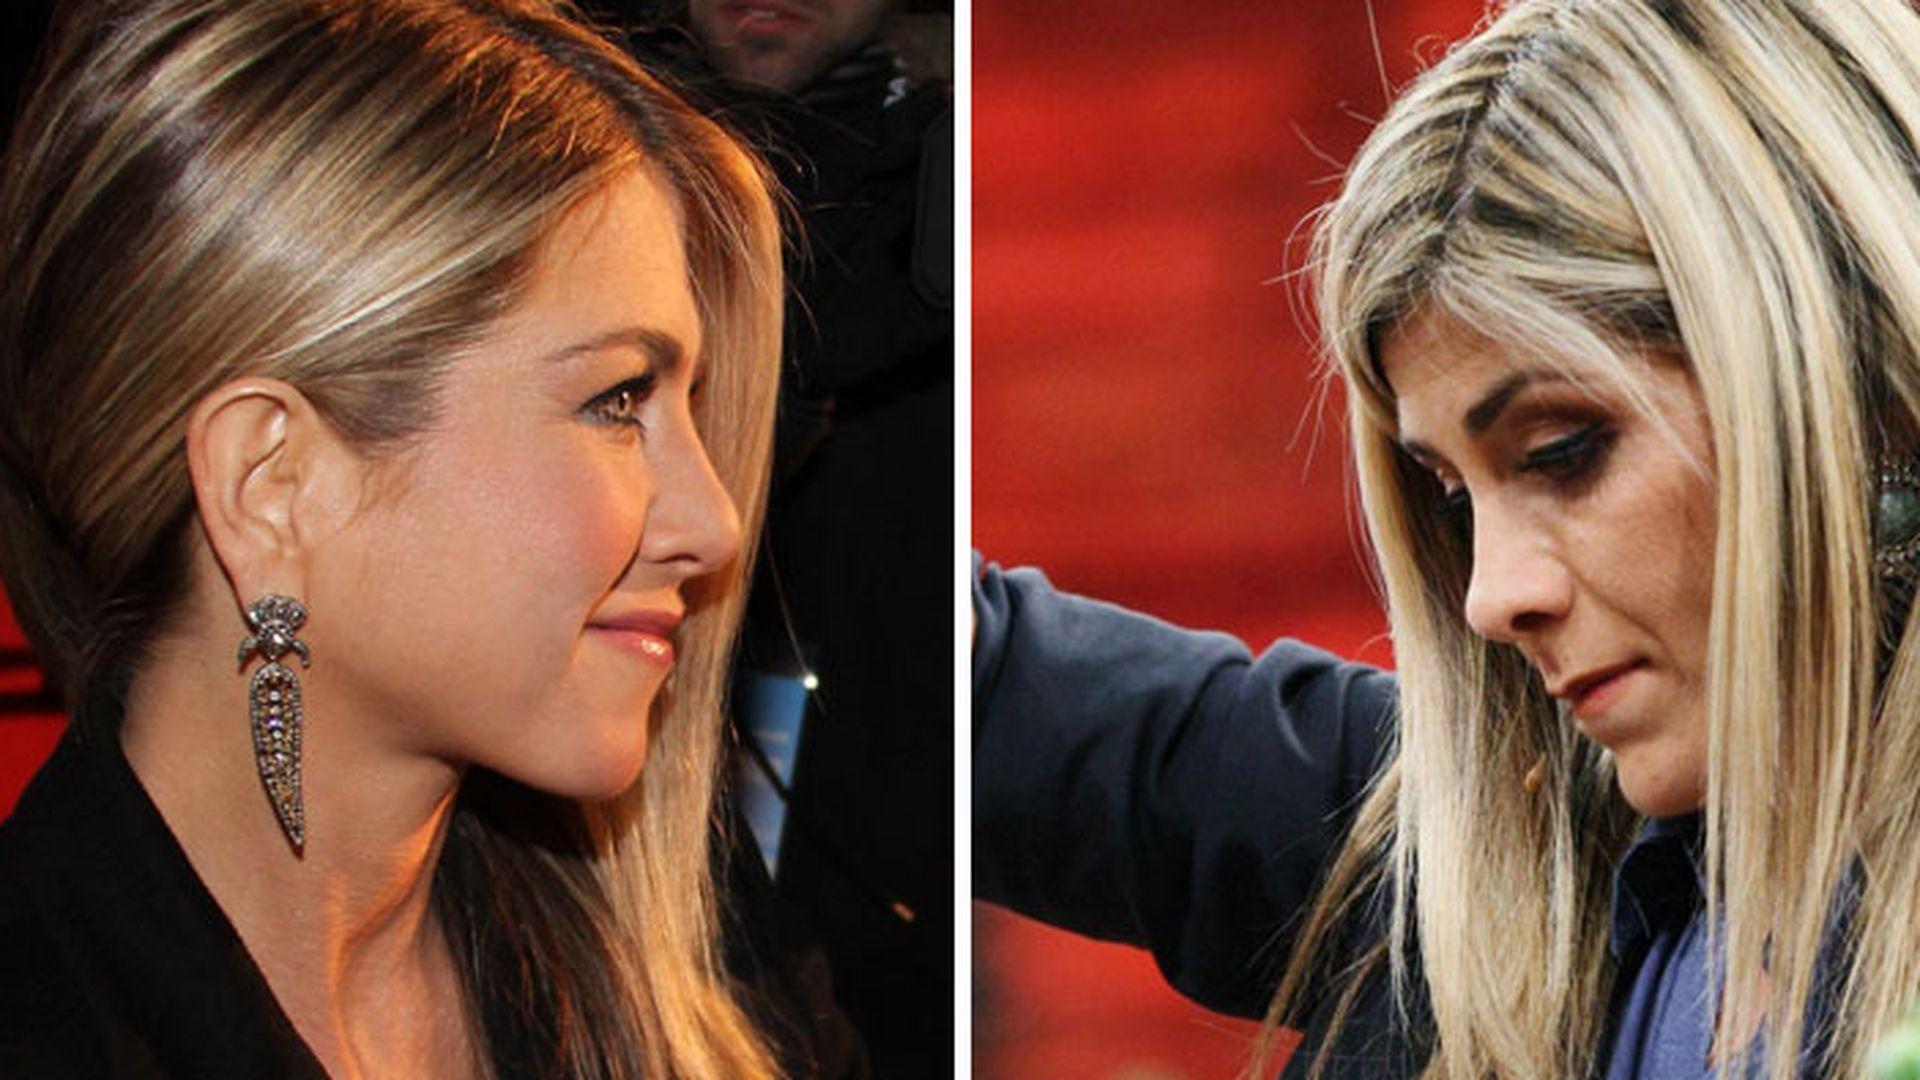 Wahnsinn Die Frau Sieht Aus Wie Jennifer Aniston